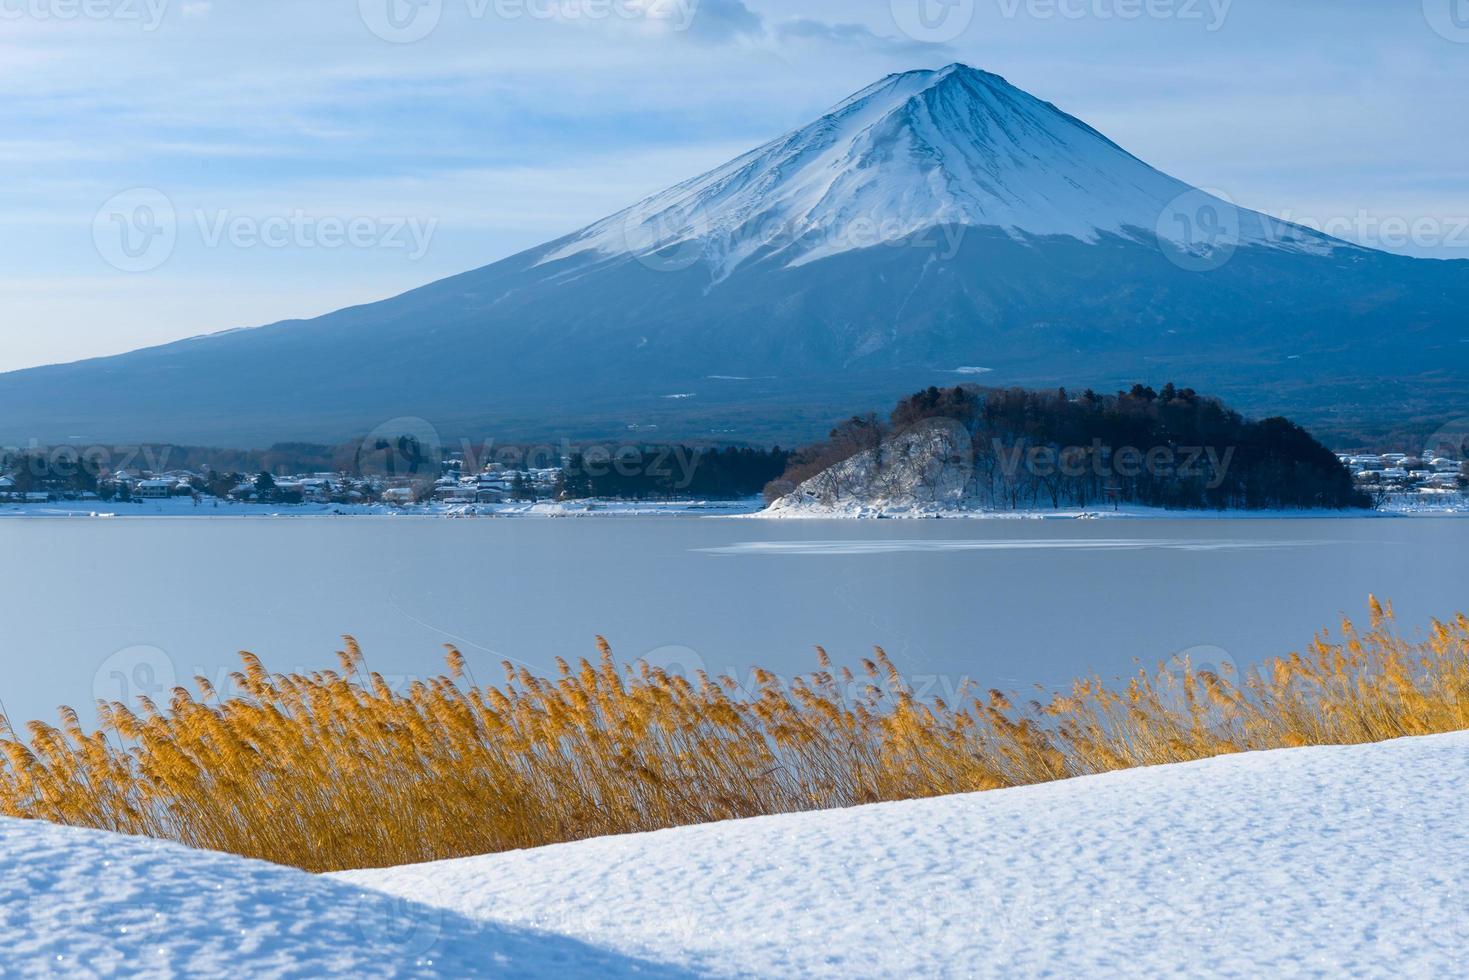 Mount Fuji Wintersaison foto